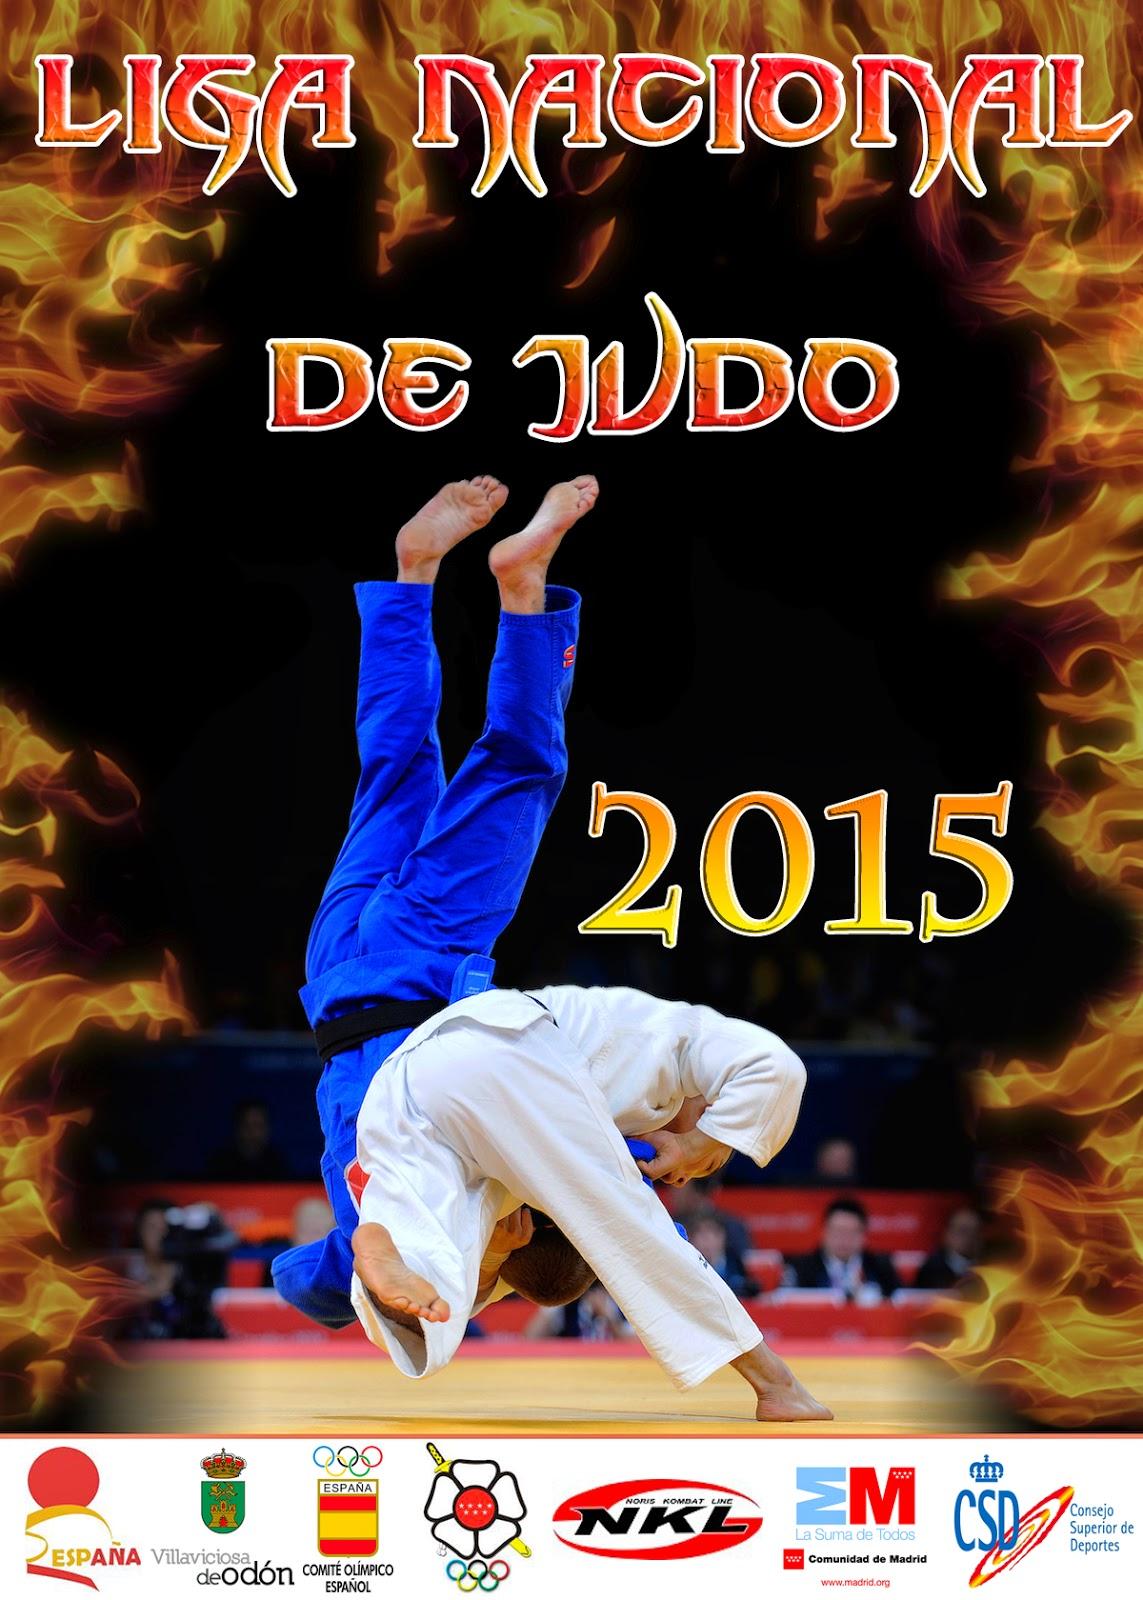 http://rfejudo.com/documentos/actividades-deportivas/convocatorias/007-European-Open-Roma-(del-15-al-17-de-febrero-de-2015).pdf